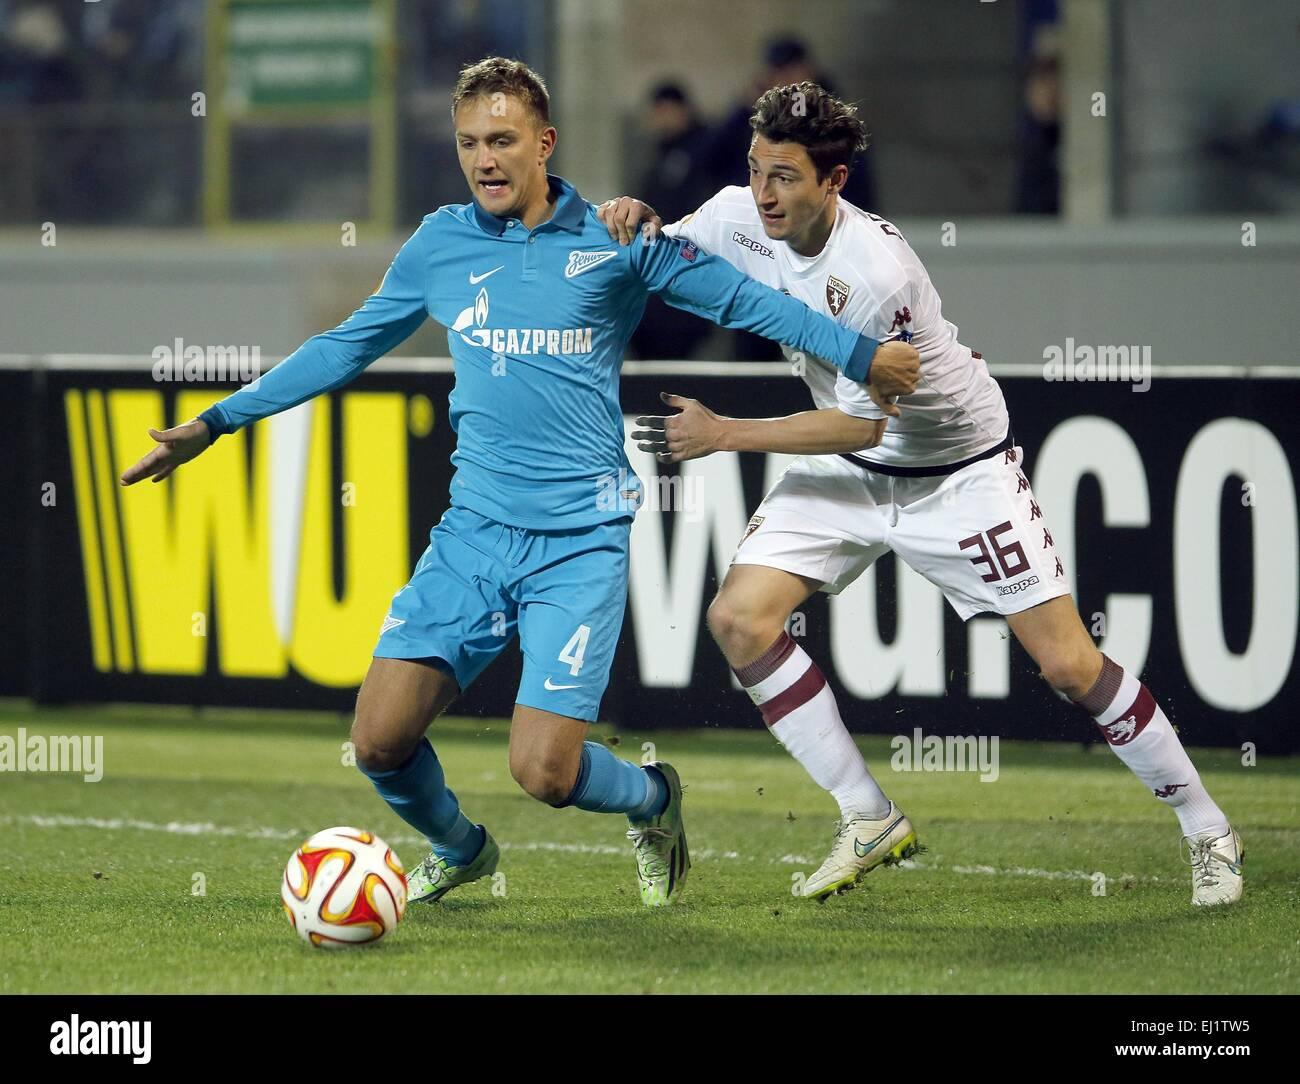 2497cfa3 Europa League 2014/15. 1/8 final. FC Zenit San Petersburgo vs Torino F.C.,  2:0. En la foto: FC Zenit player Domenico Criscito (4), Torino F.C. jugador  ...